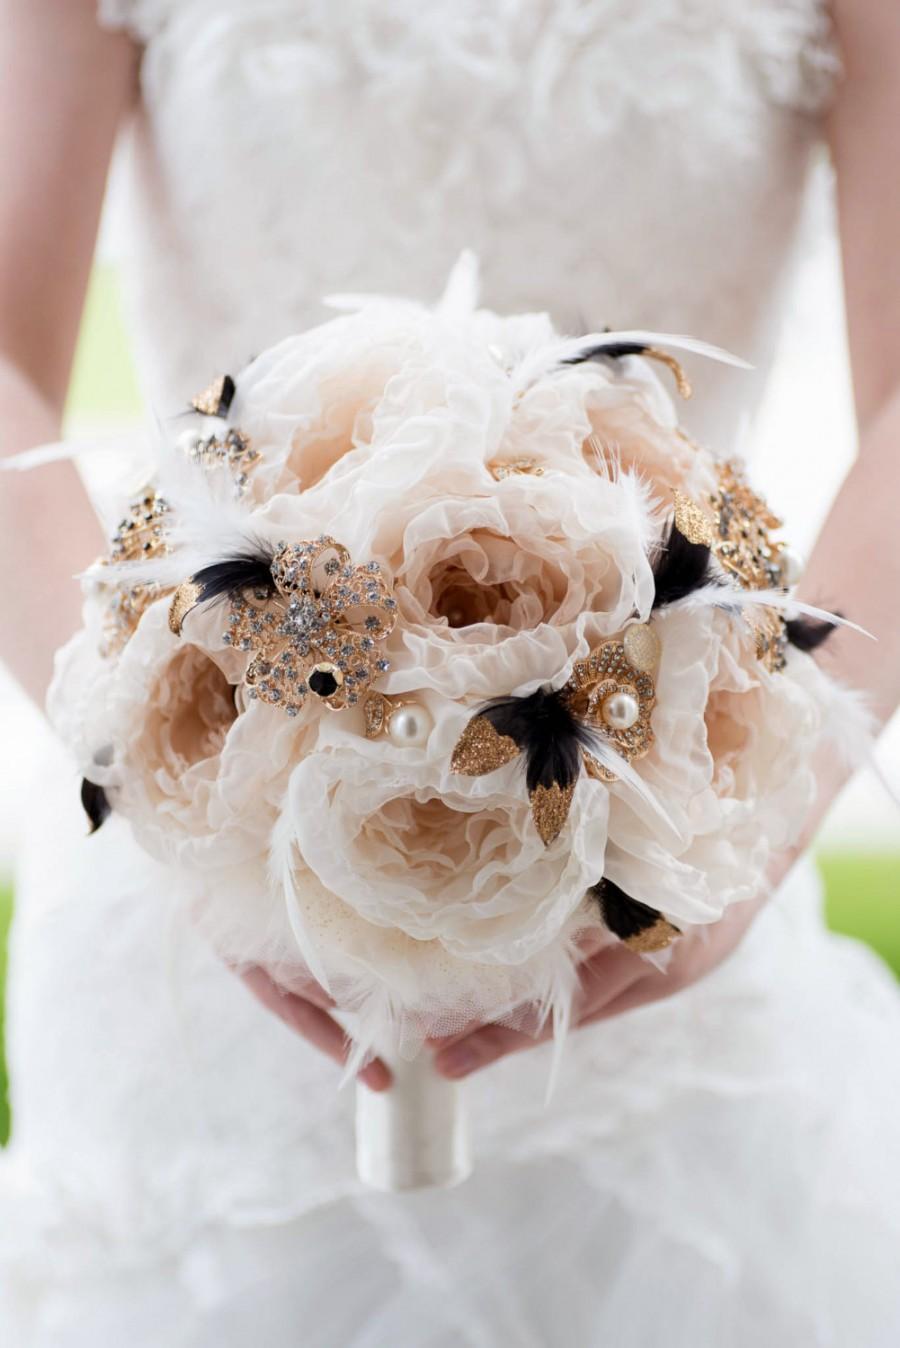 Hochzeit - Custom Black Gold Brooch Bouquet, Fabric Flower Bouquet, Fabric Bouquet, Bridal Bouquet, Wedding Bouquet, Great Gatsby - 11 inch Bouquet